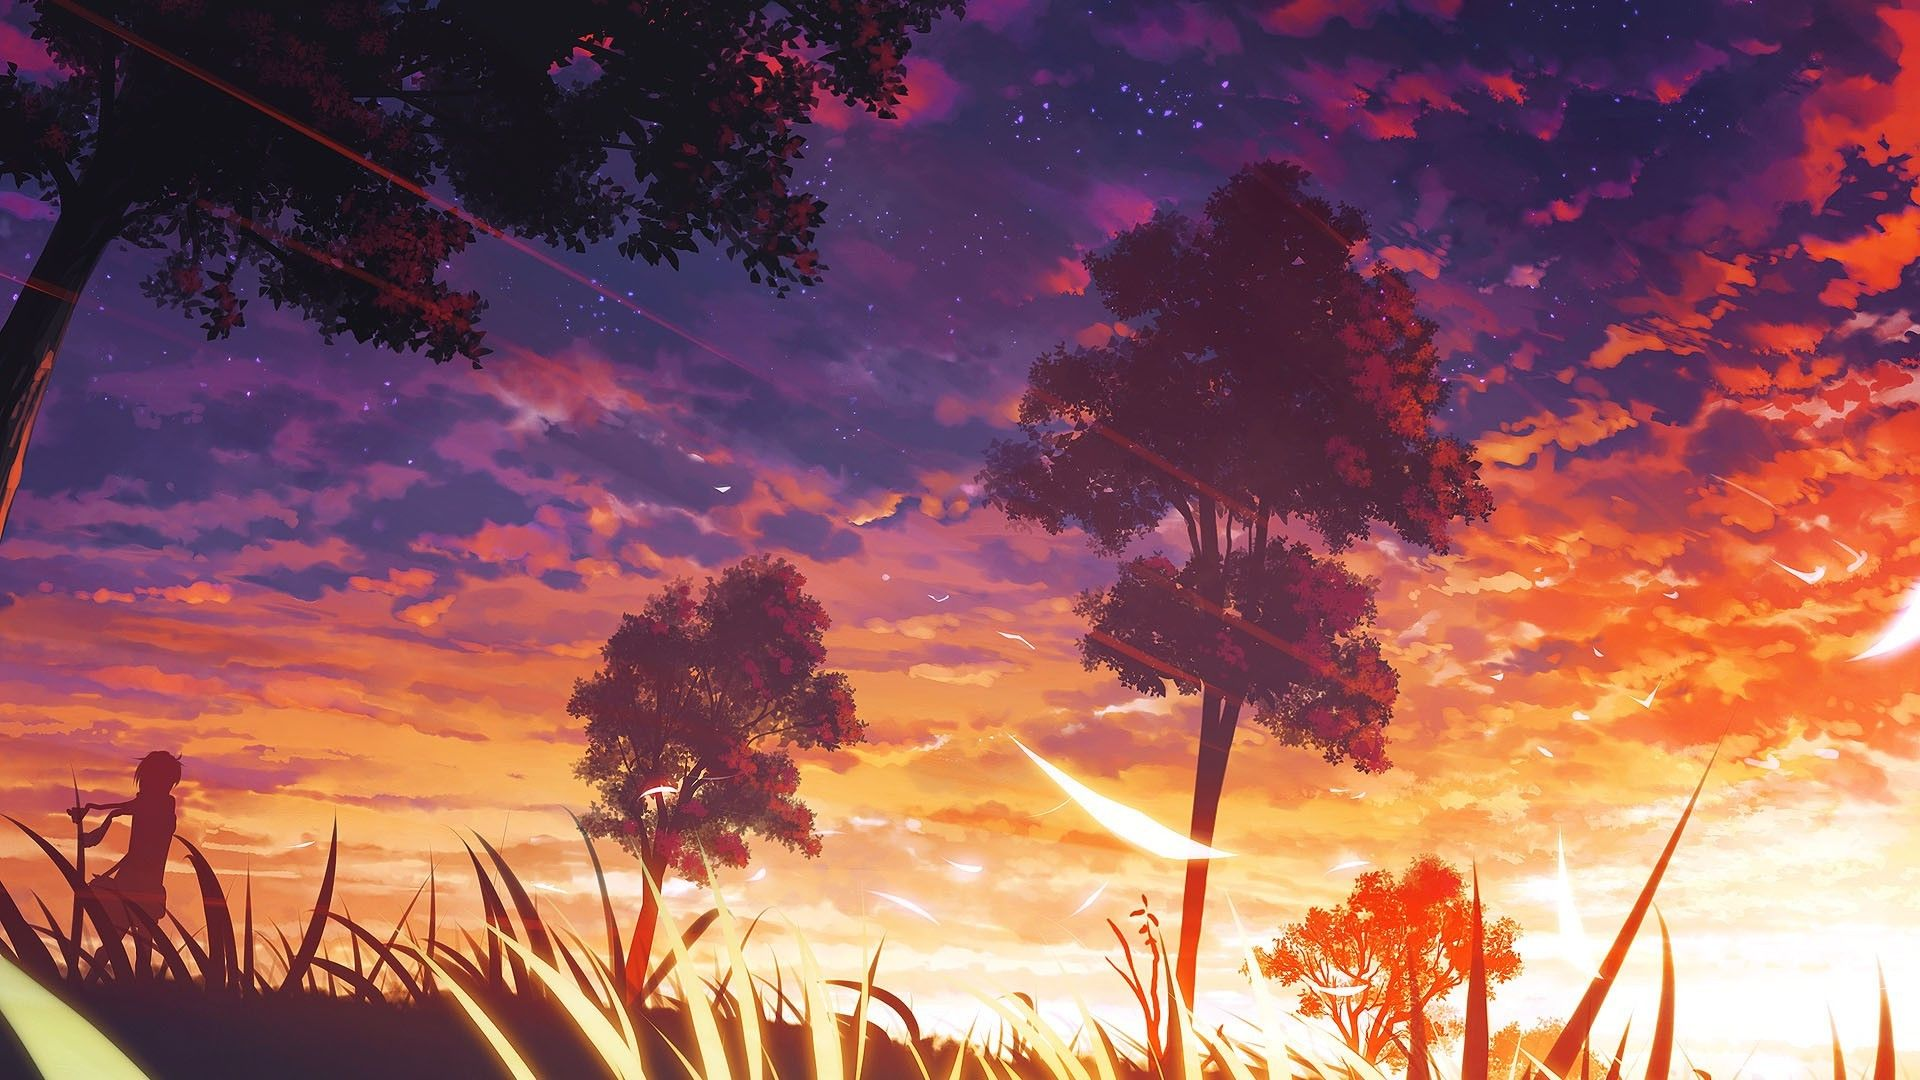 Download 6100 Background Art Hd HD Terbaik